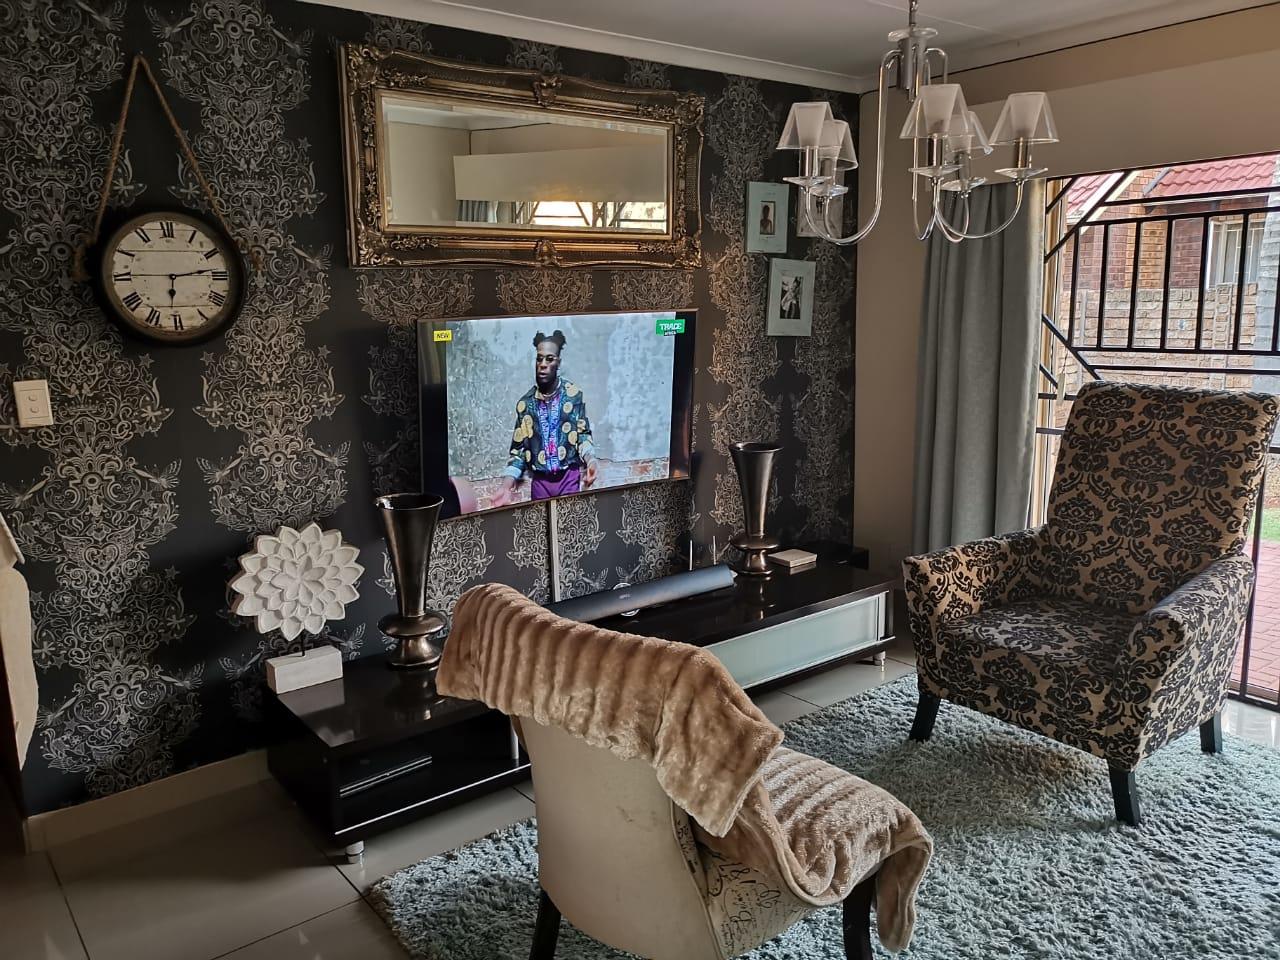 Rhino ridge estate centurion Stylish 3 bedrooms house for sale